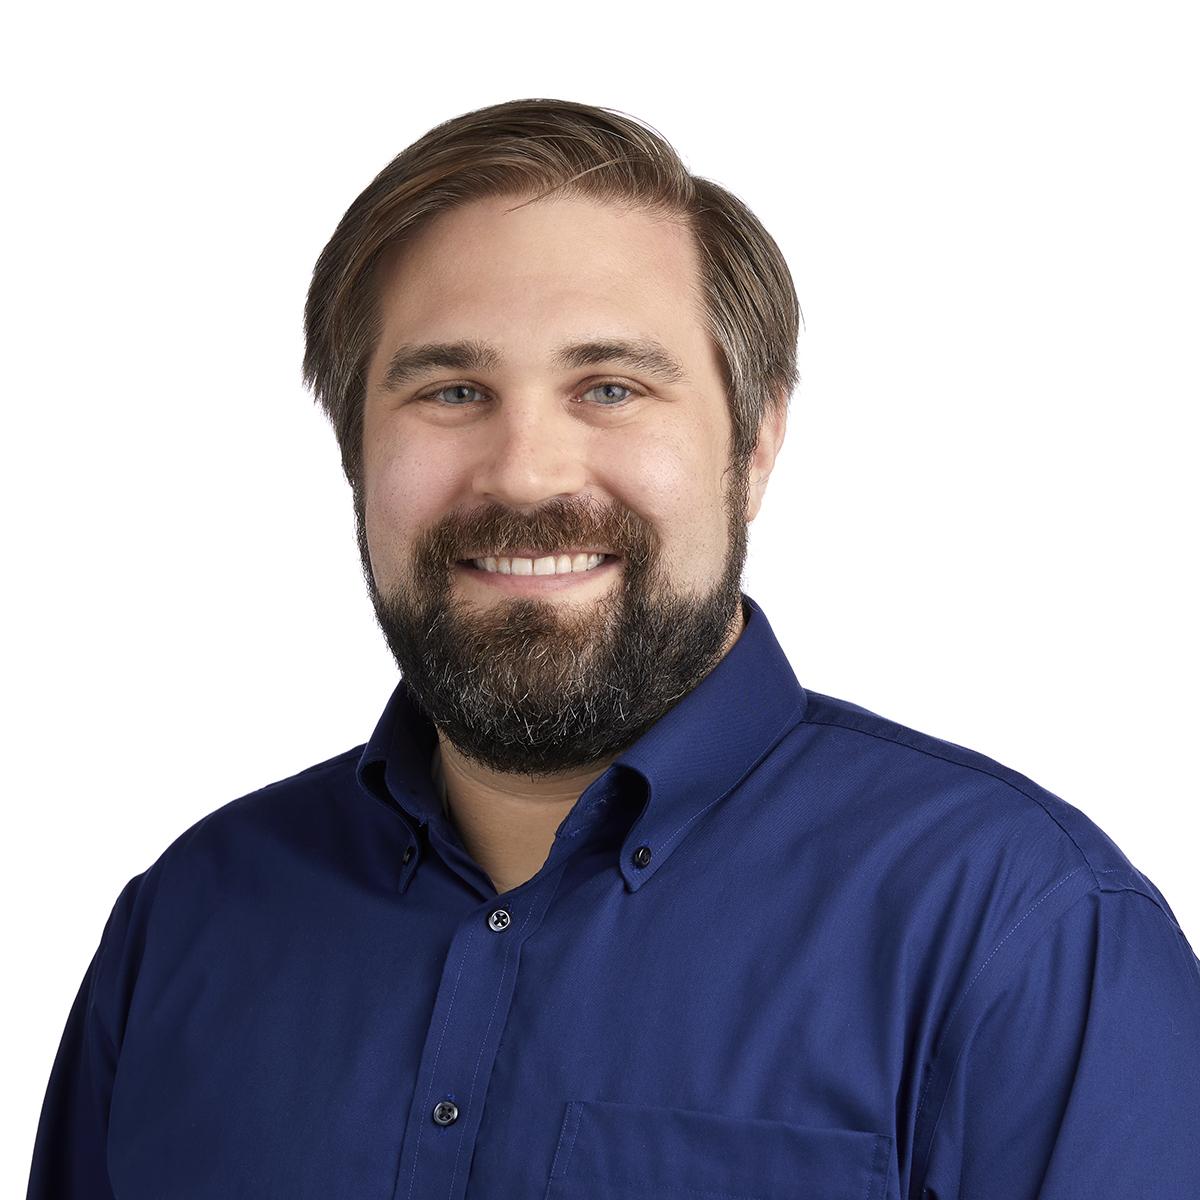 Headshot of Jason Becker